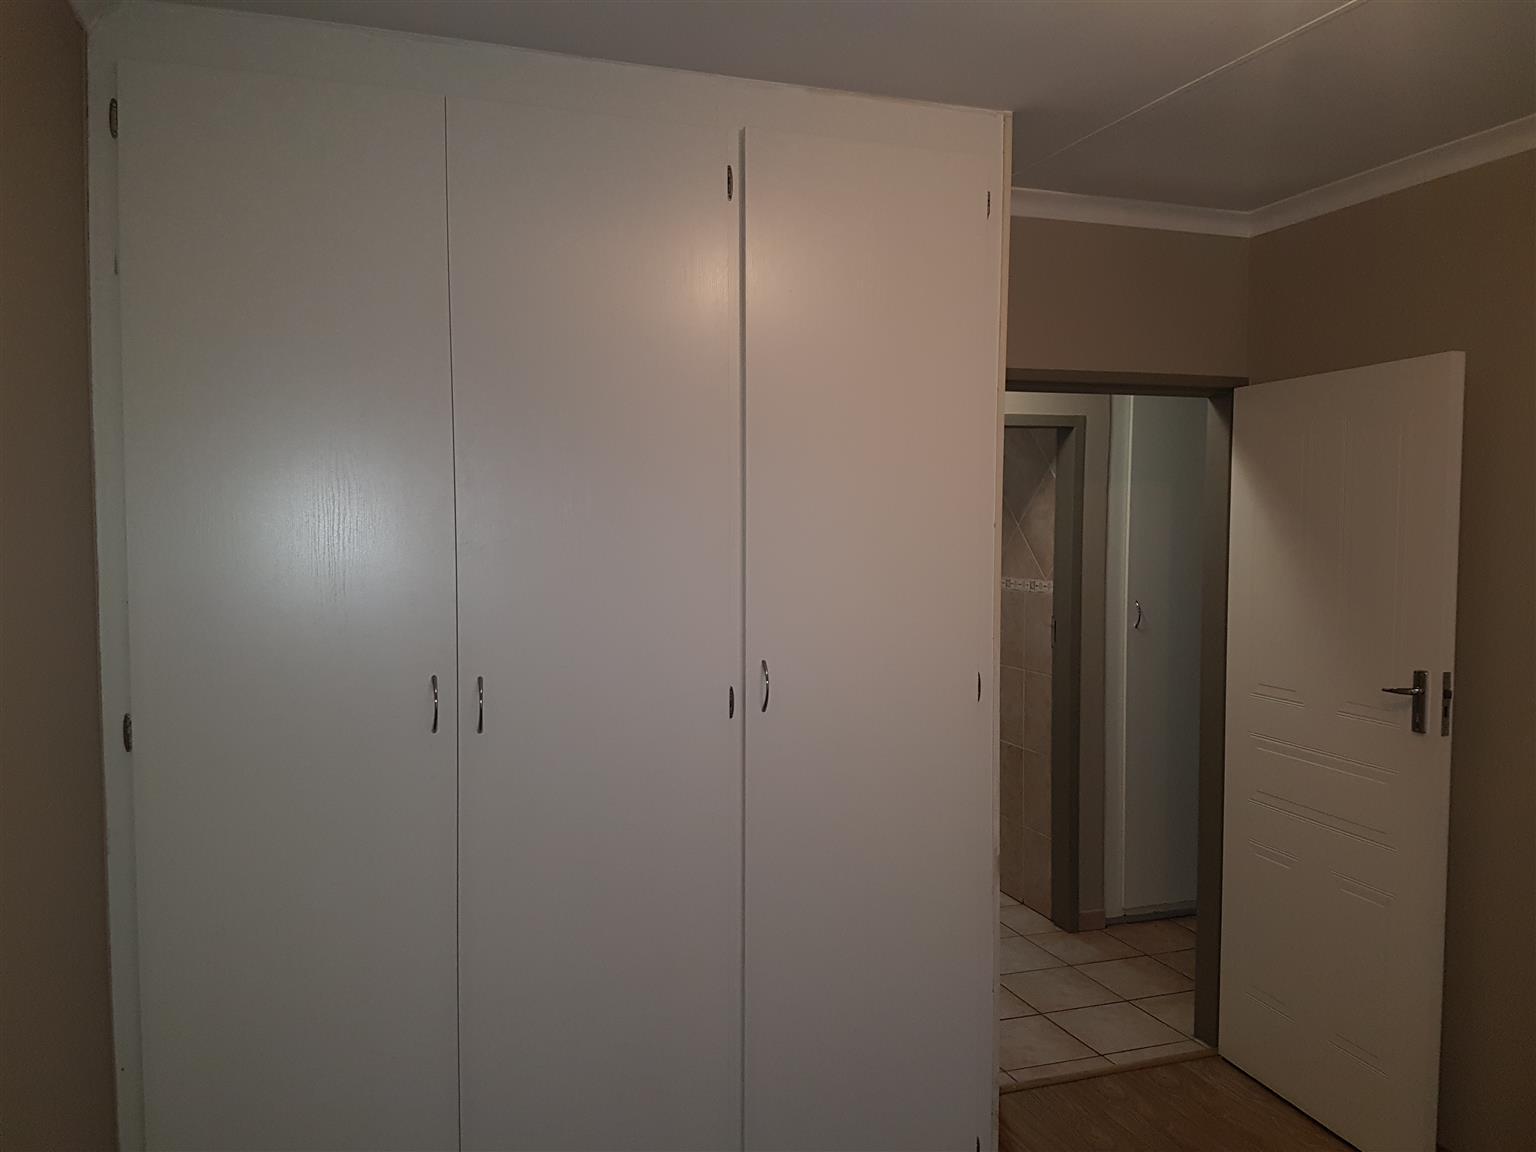 3 Bedroom House in security complex